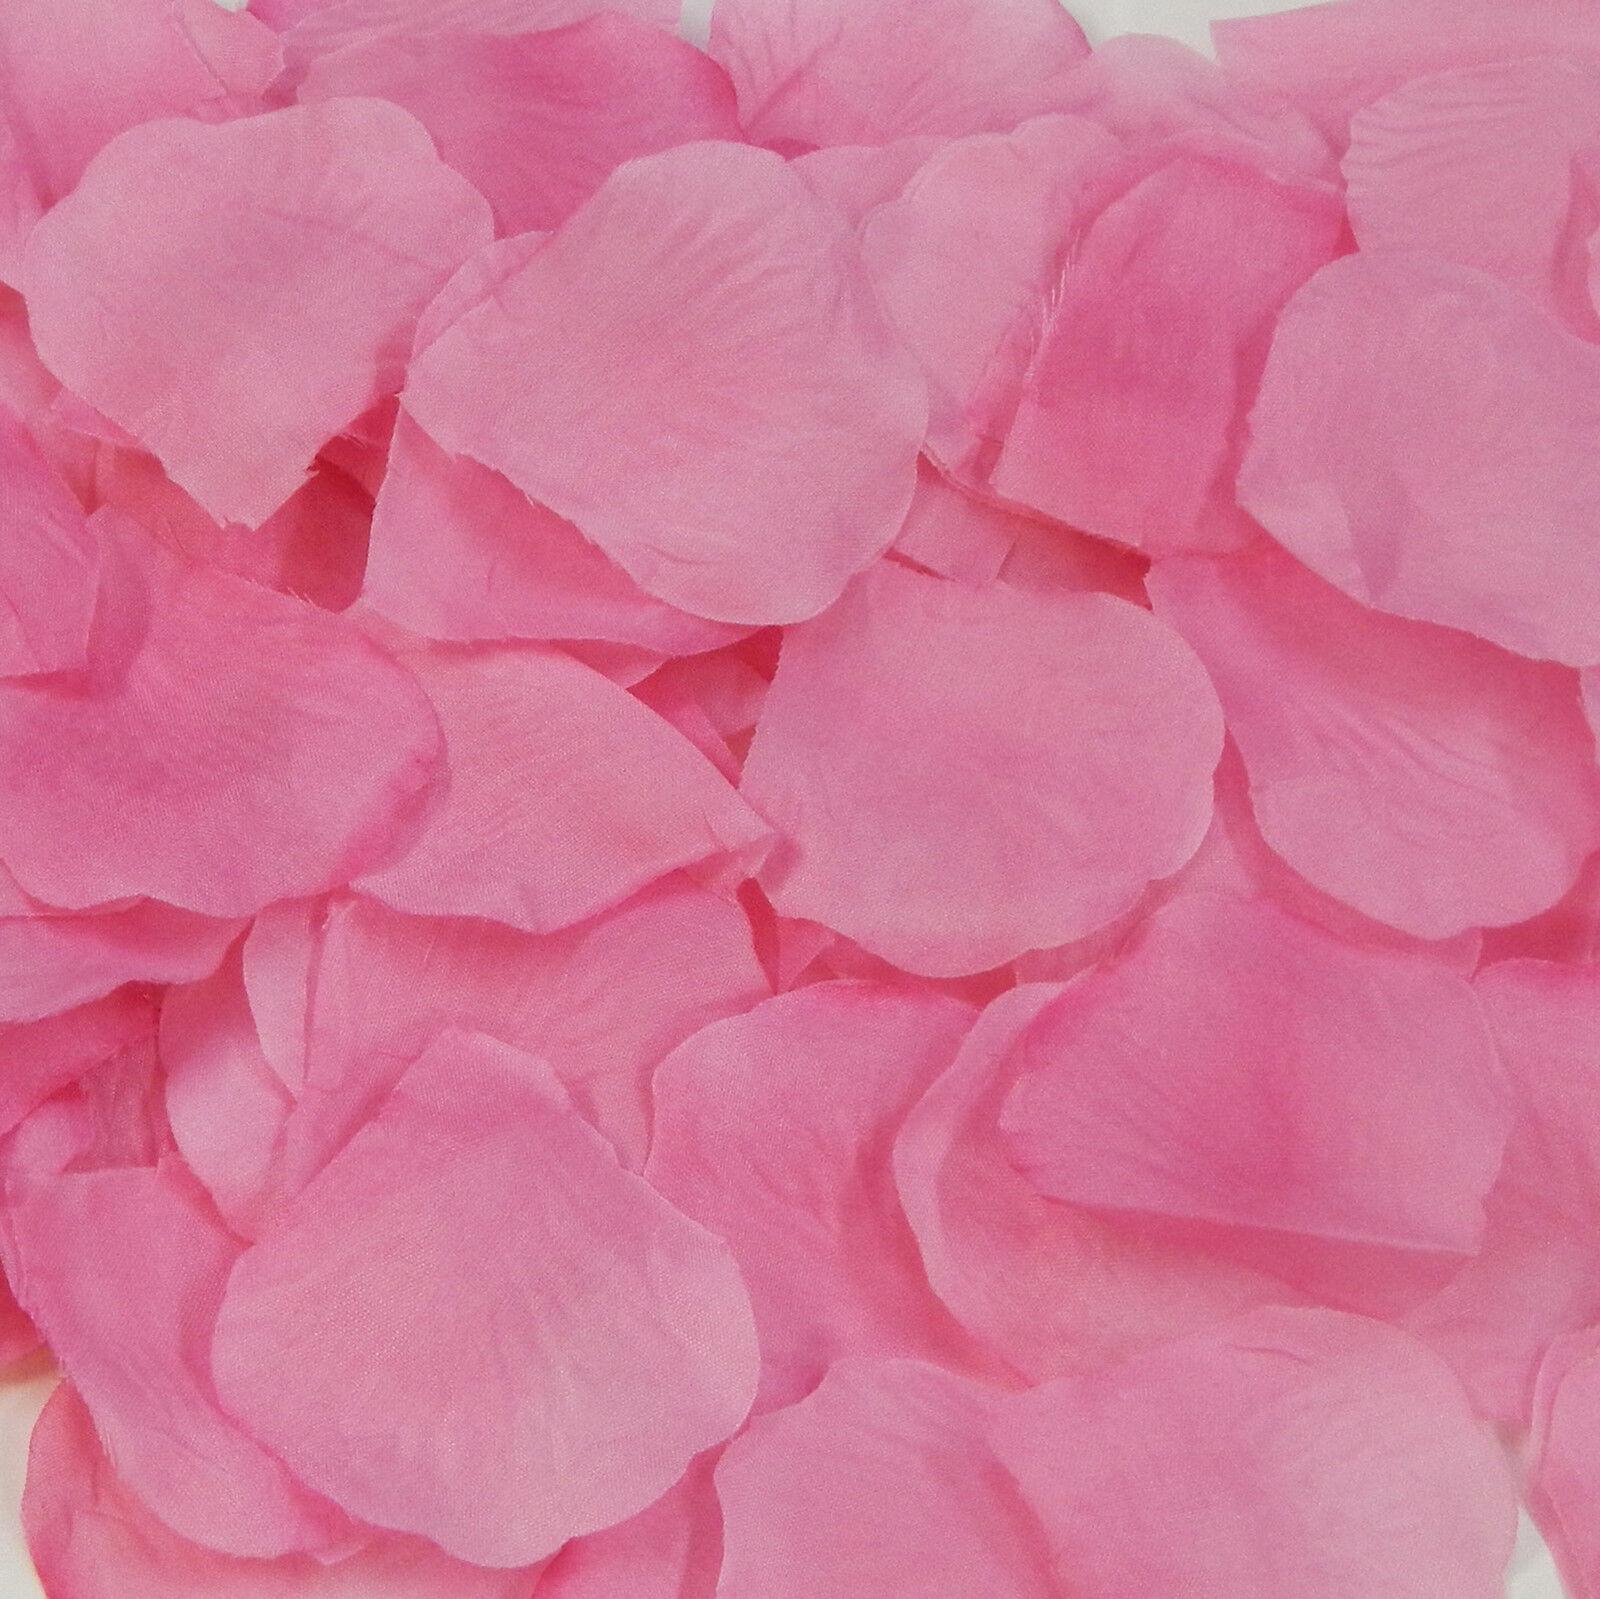 Silk rose petals wedding flower bridal girls basket decoration picture 2 of 2 mightylinksfo